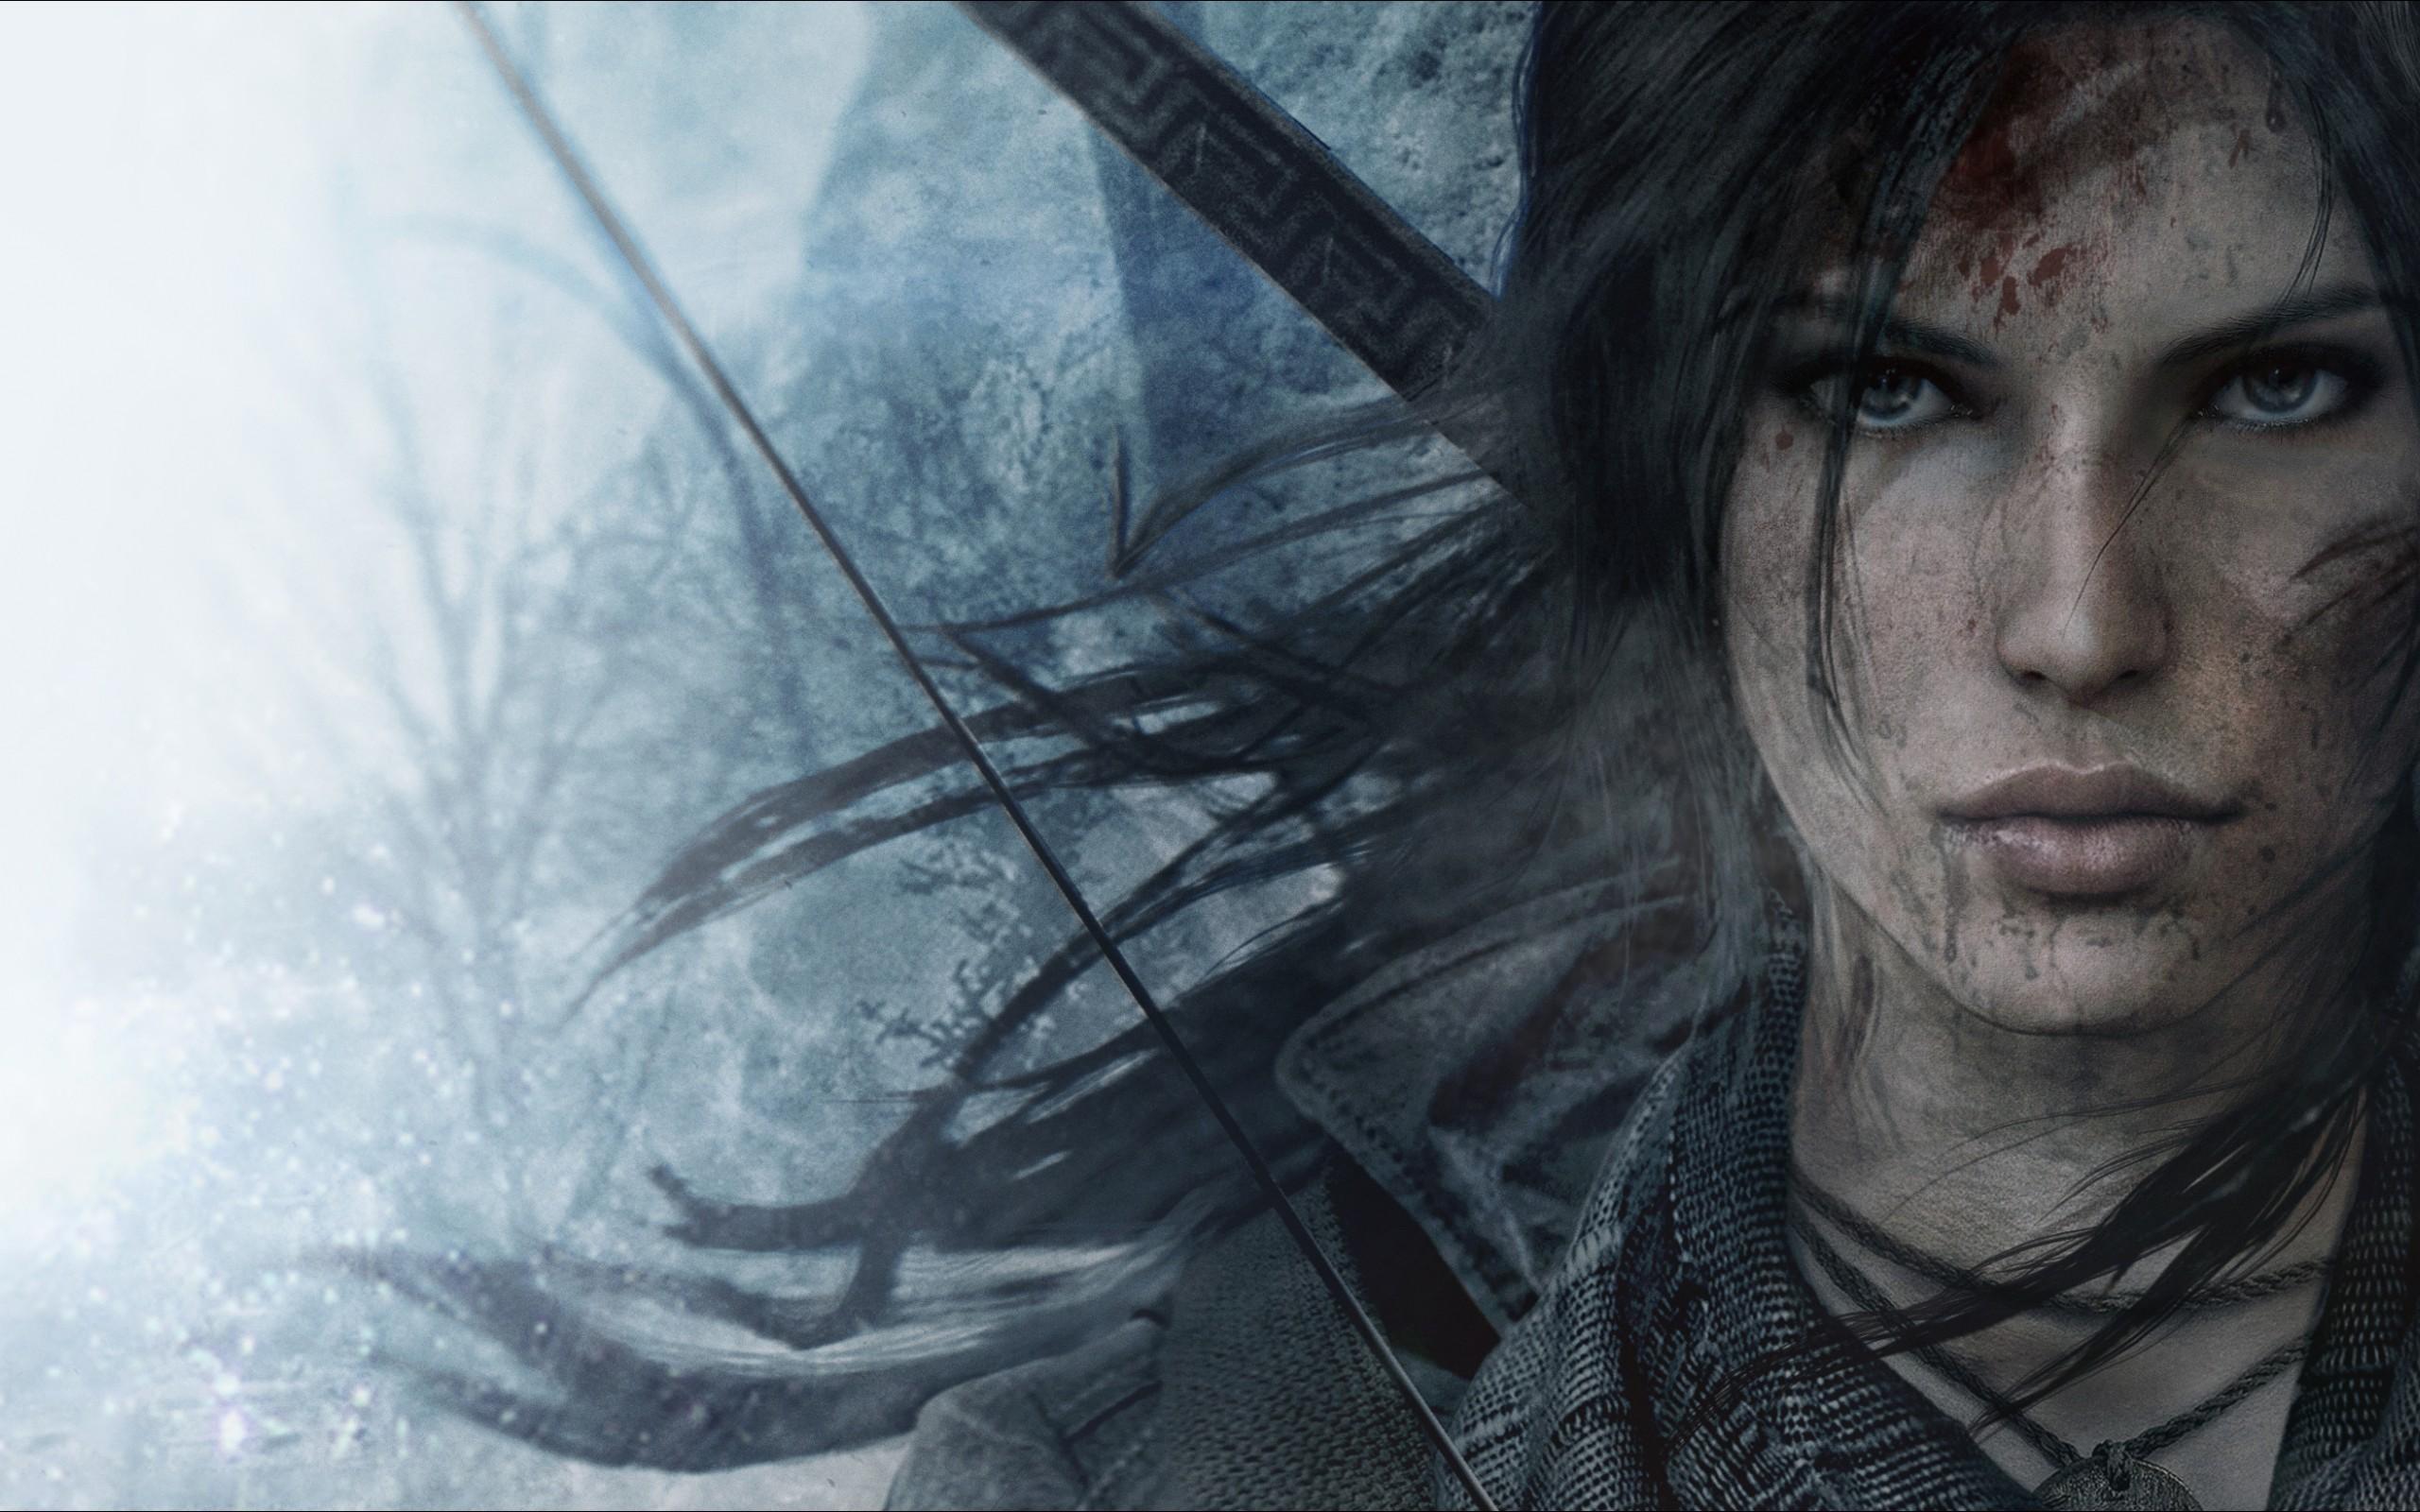 Face Drawing Lara Croft Rise Of The Tomb Raider Darkness Sketch Screenshot Fictional Character